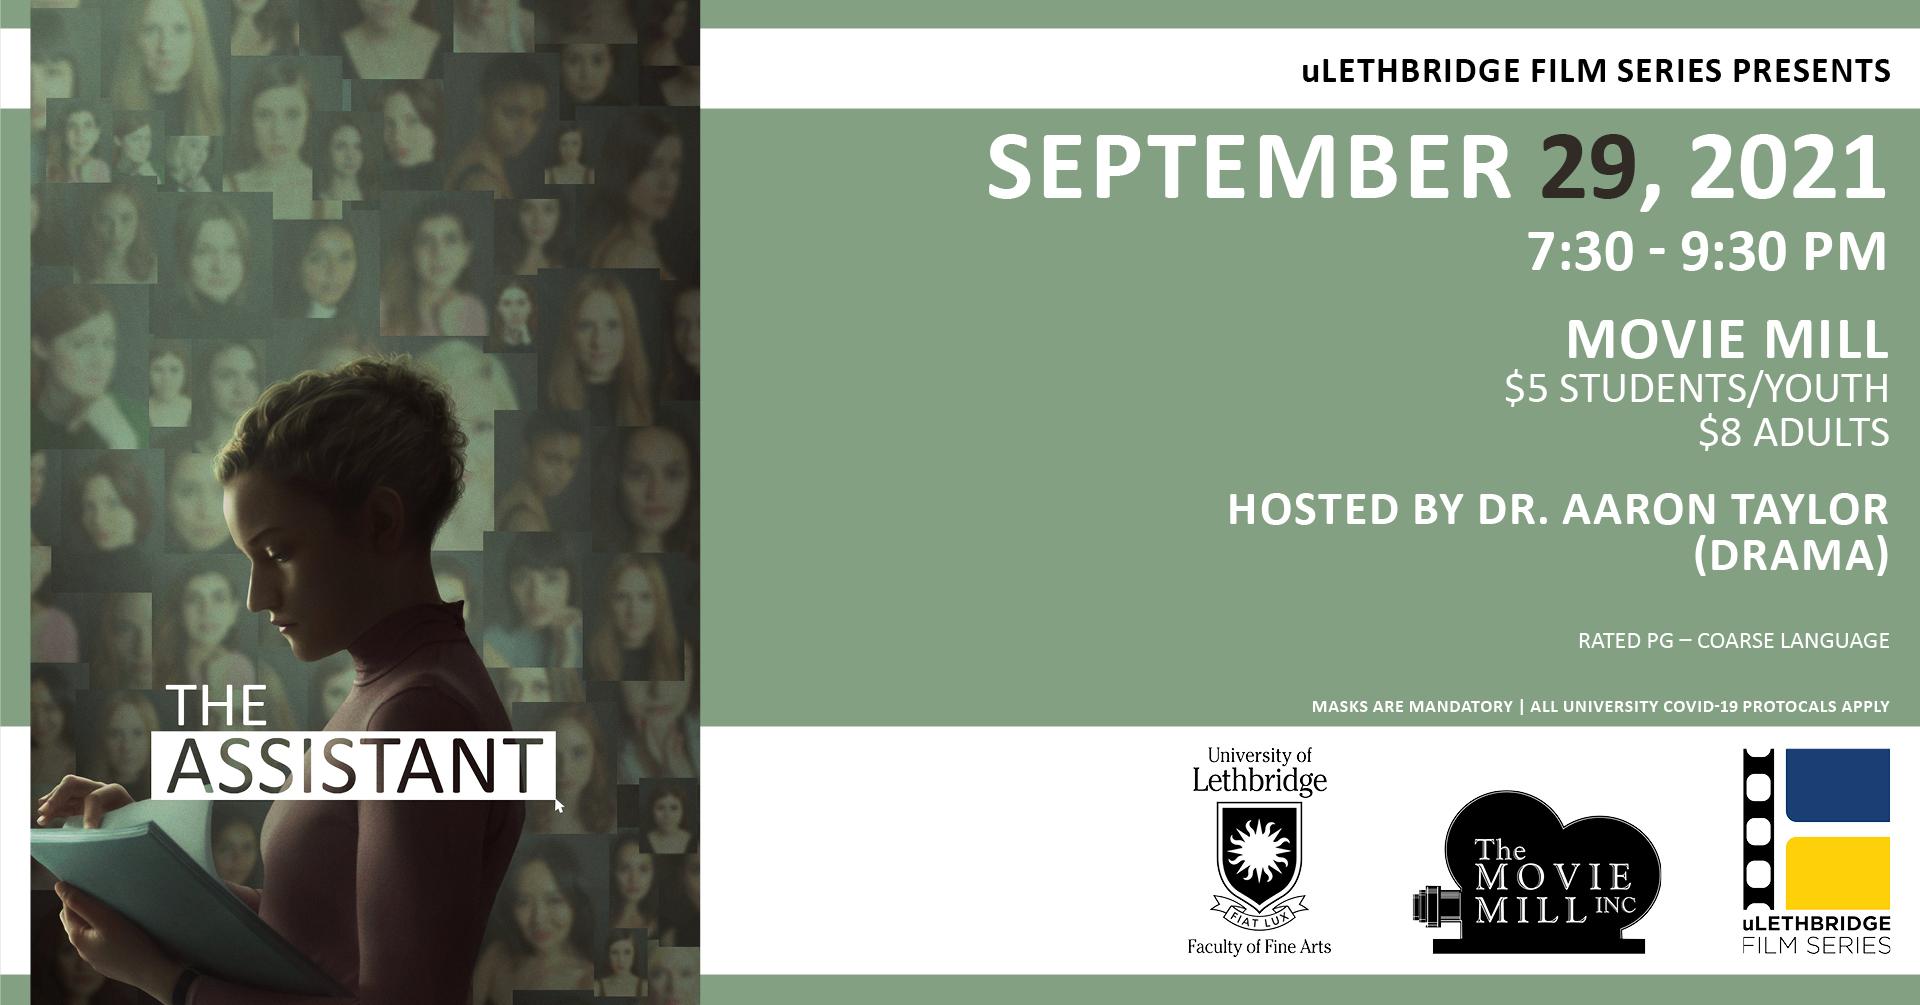 uLethbridge Film Series presents The Assistant.